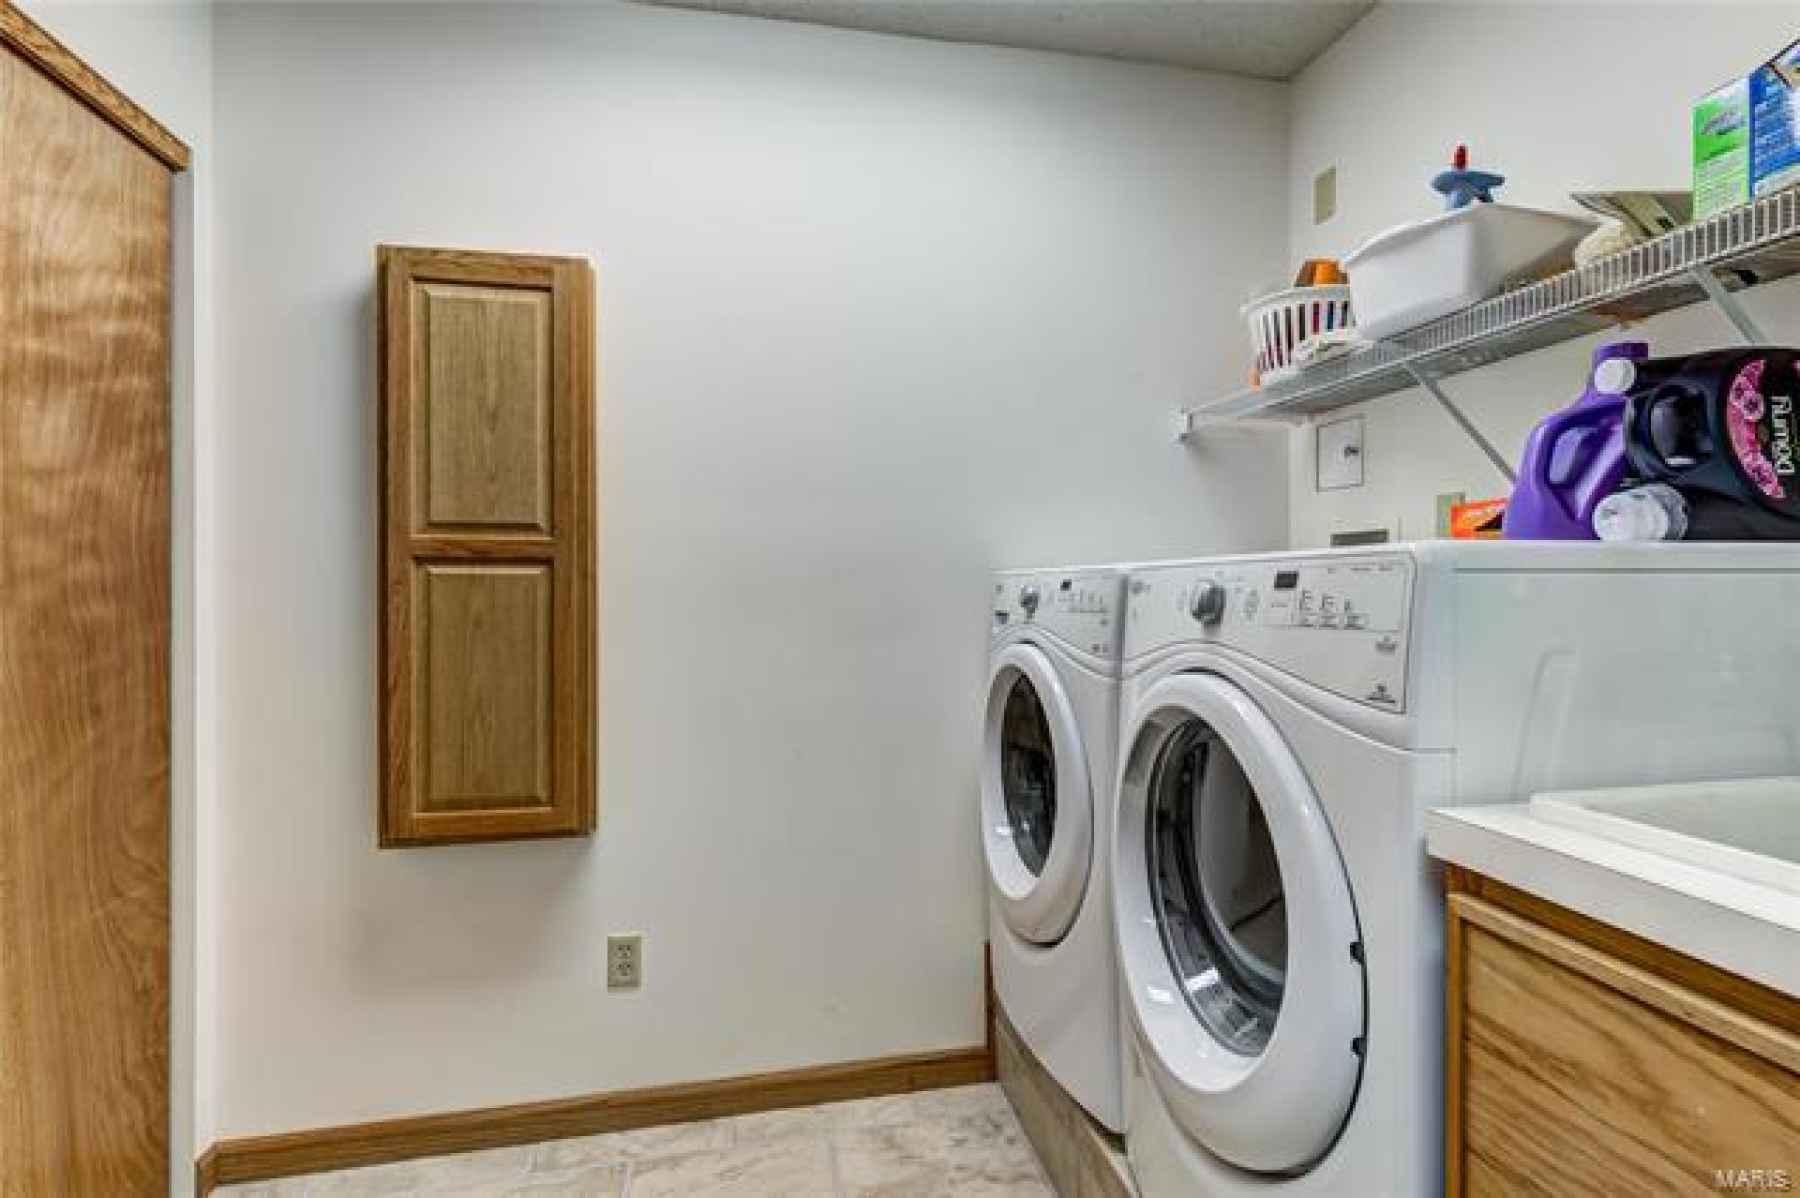 Laundry room - spotless